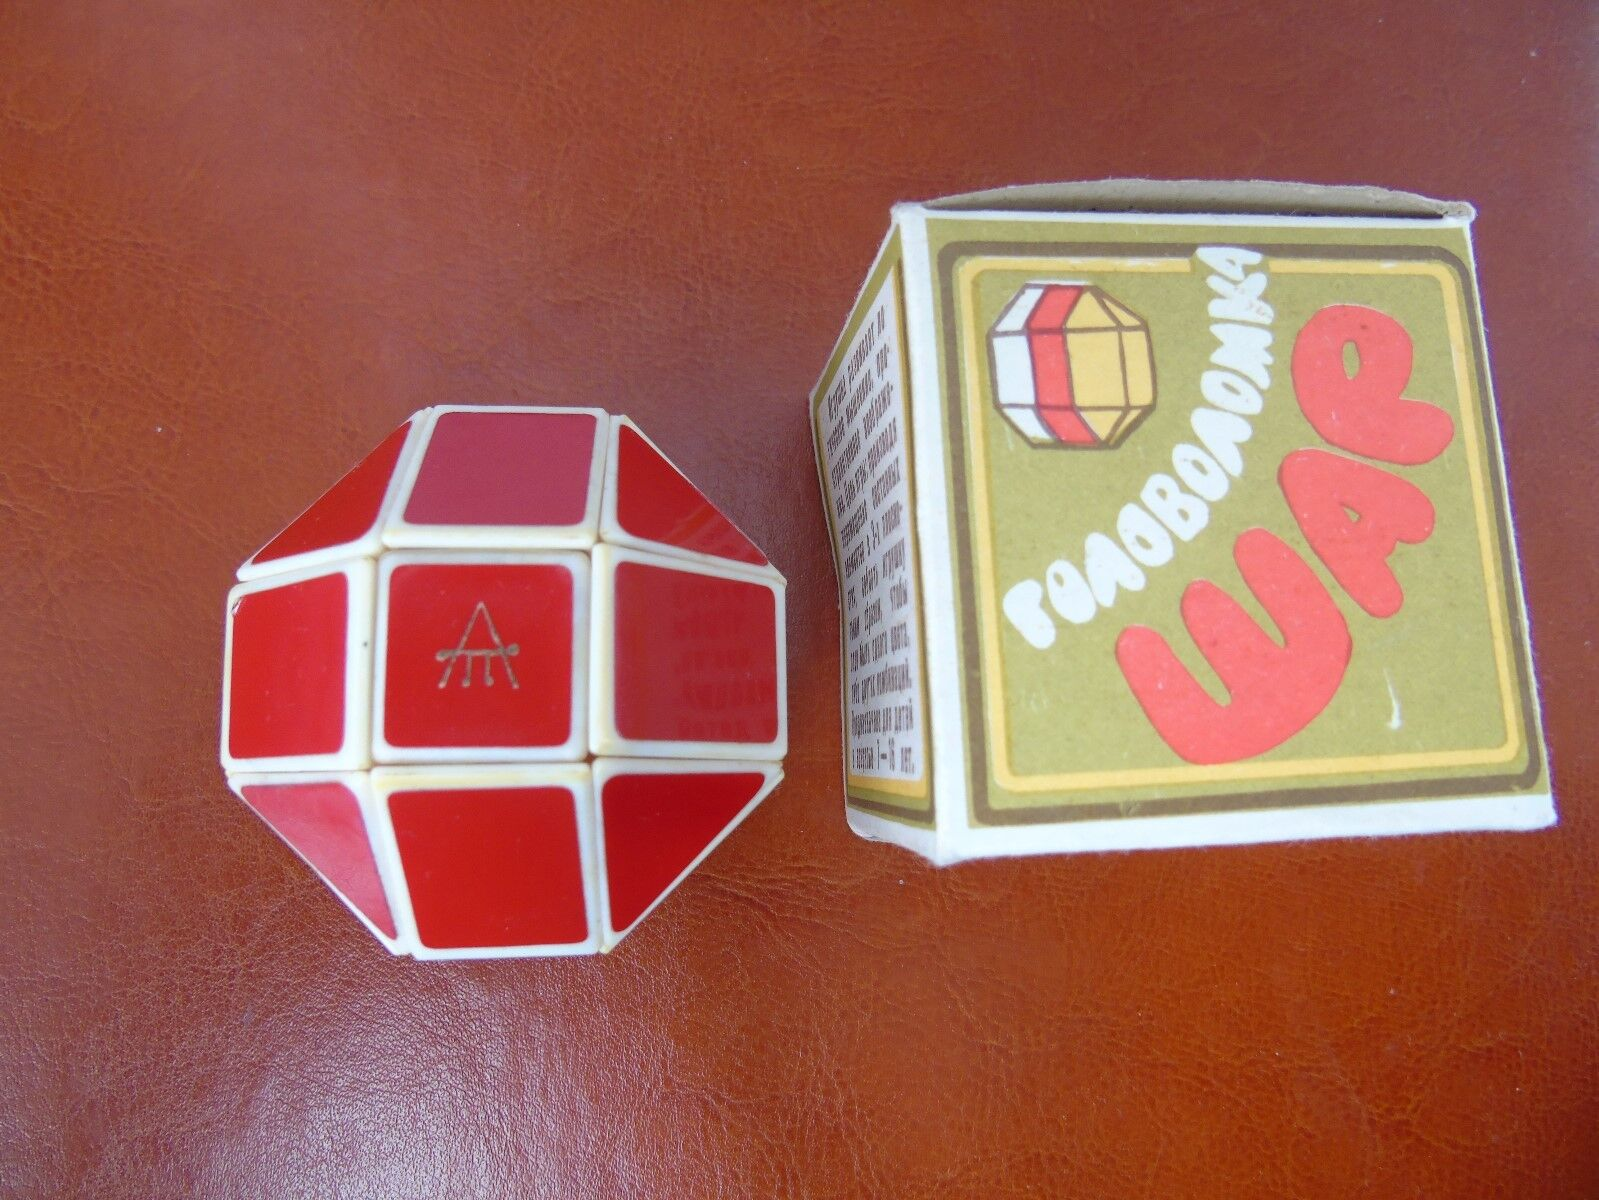 RARE Logical game, Puzzle  BALL ,  Rubik's Cube, USSR, original, vintage, 80s